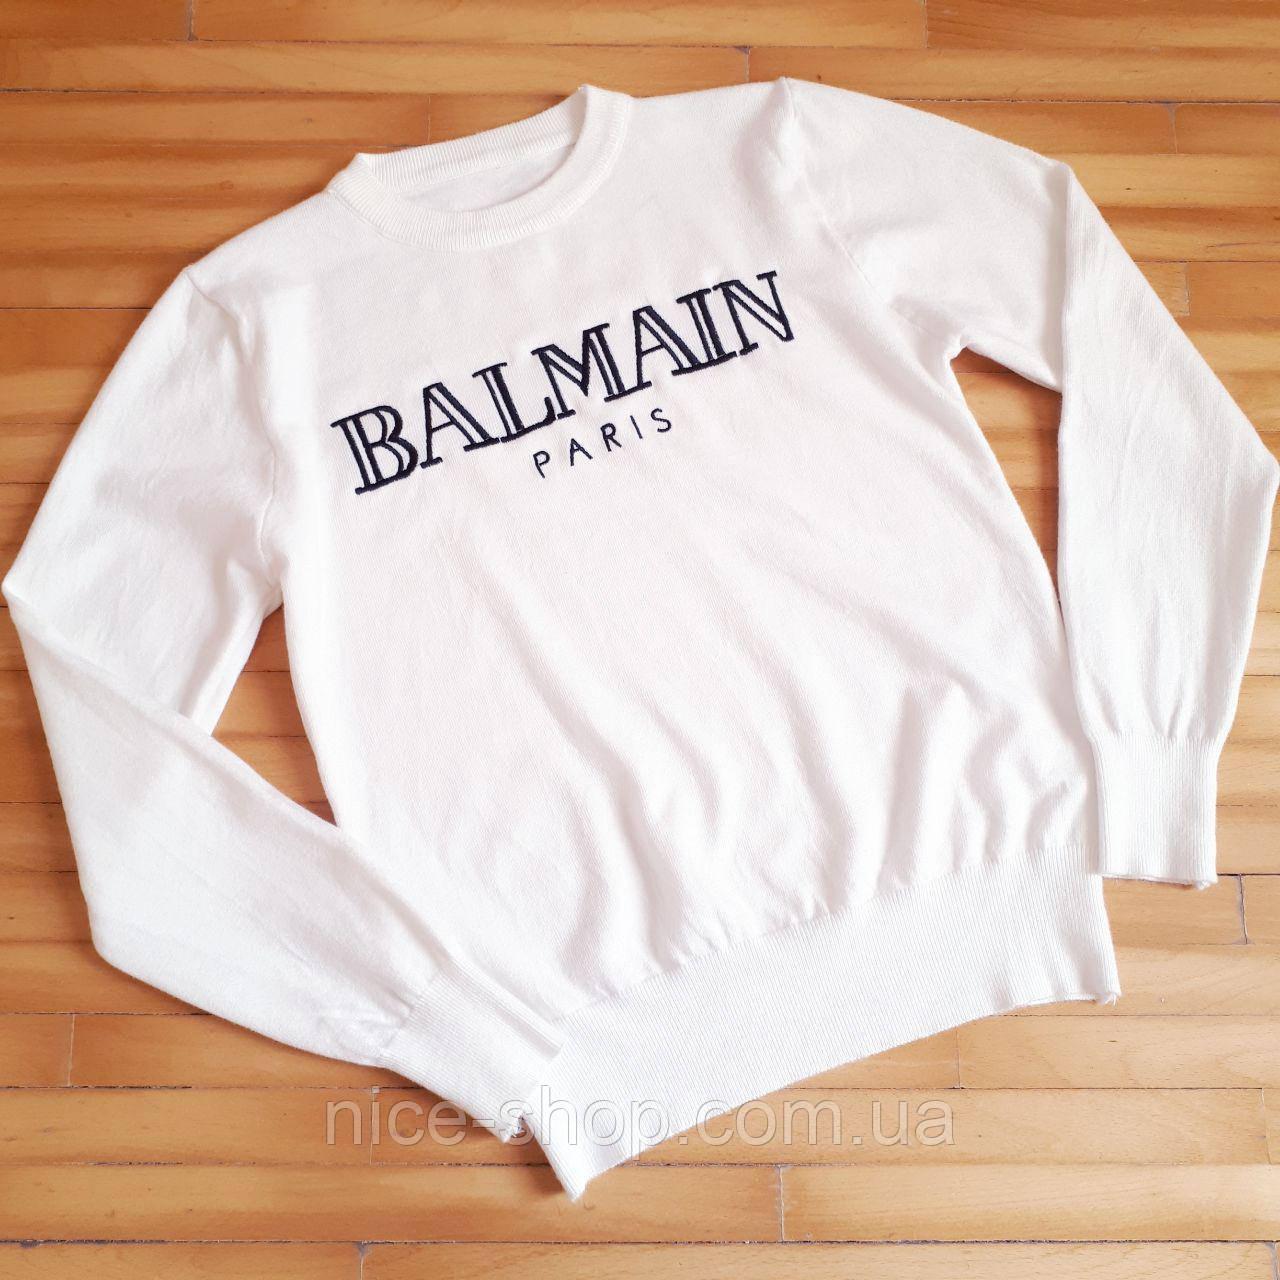 Свитер Balmain  белый